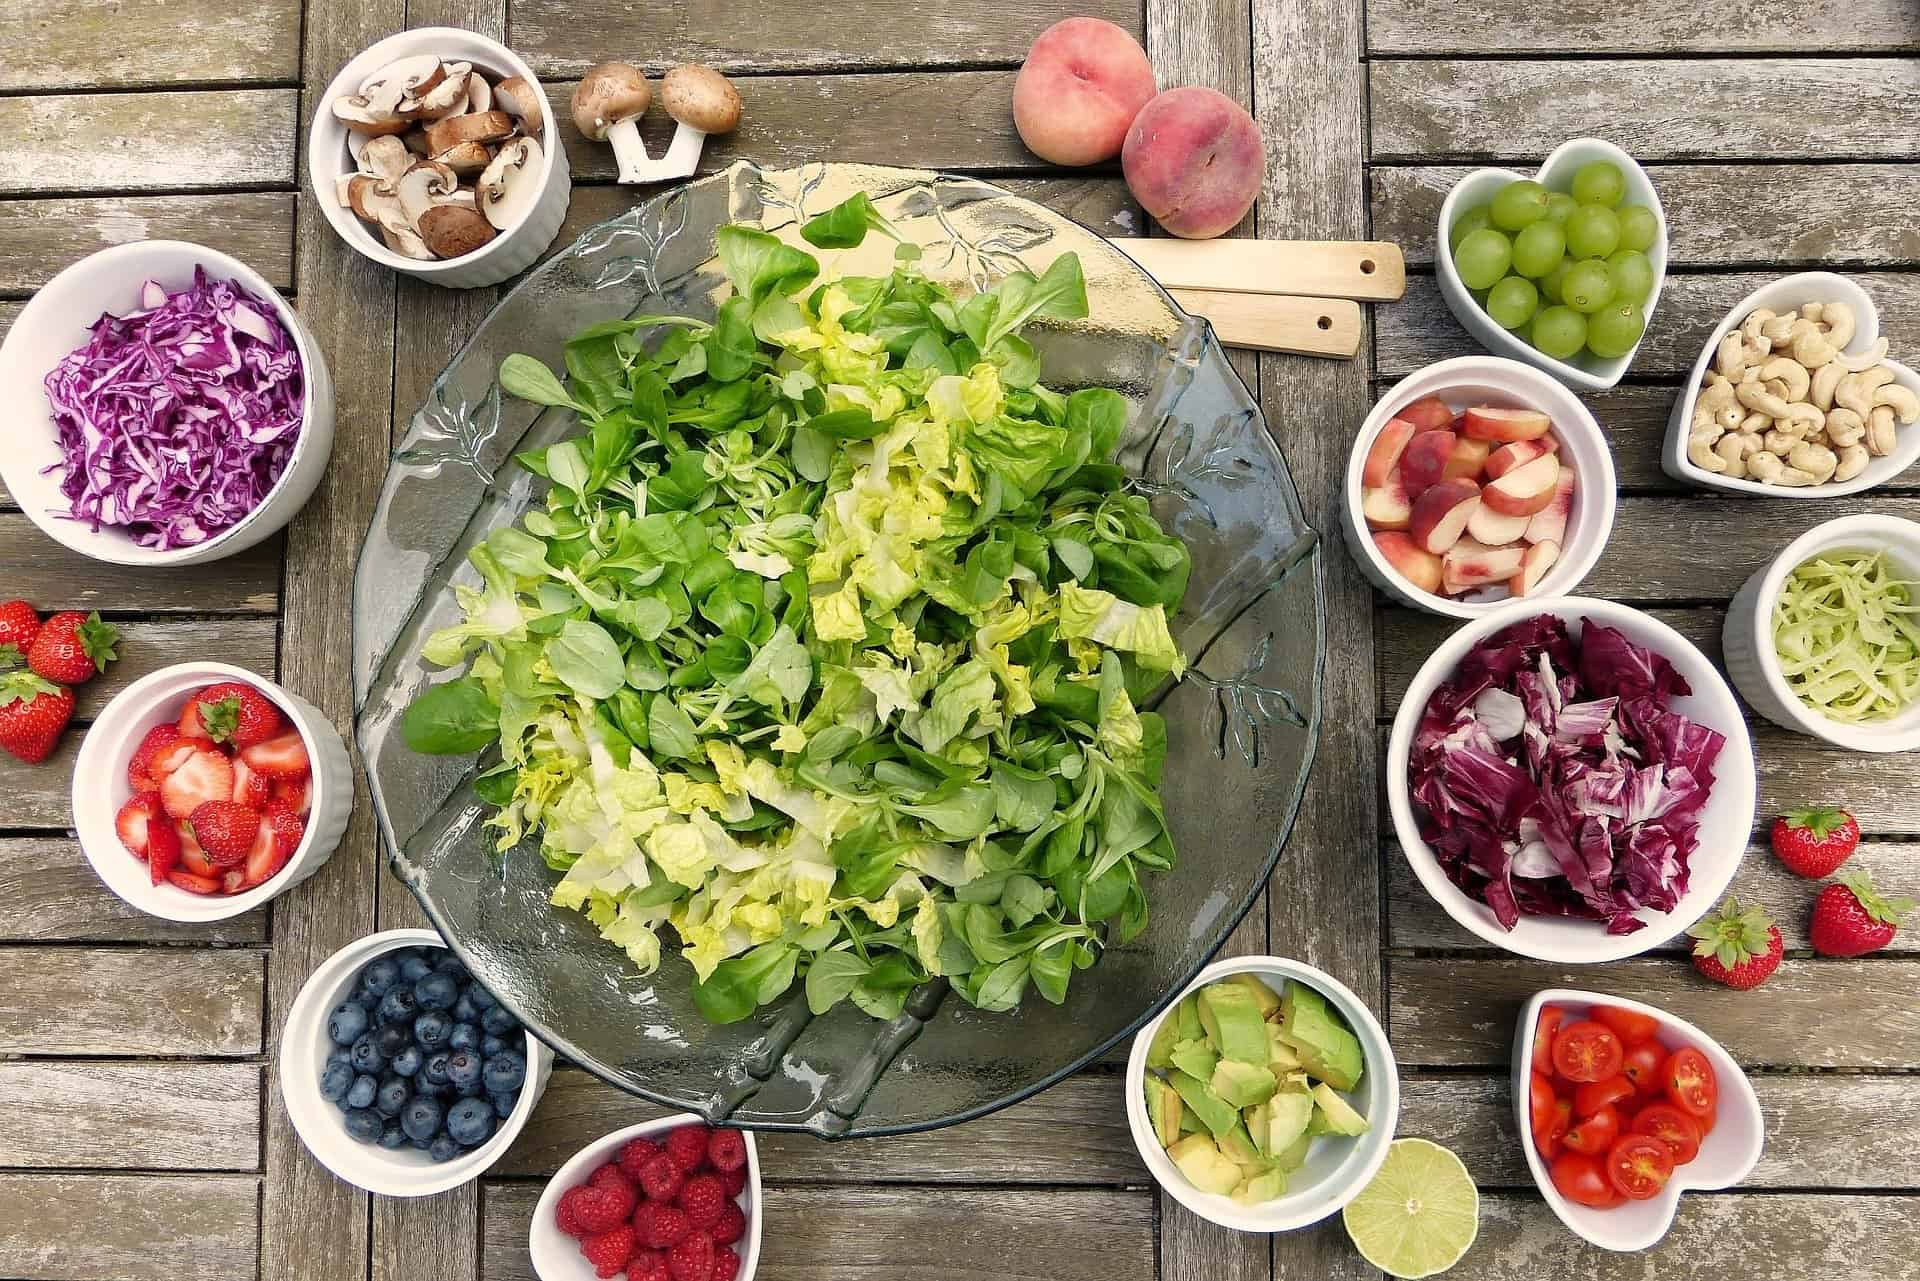 Salad and fruit bowls